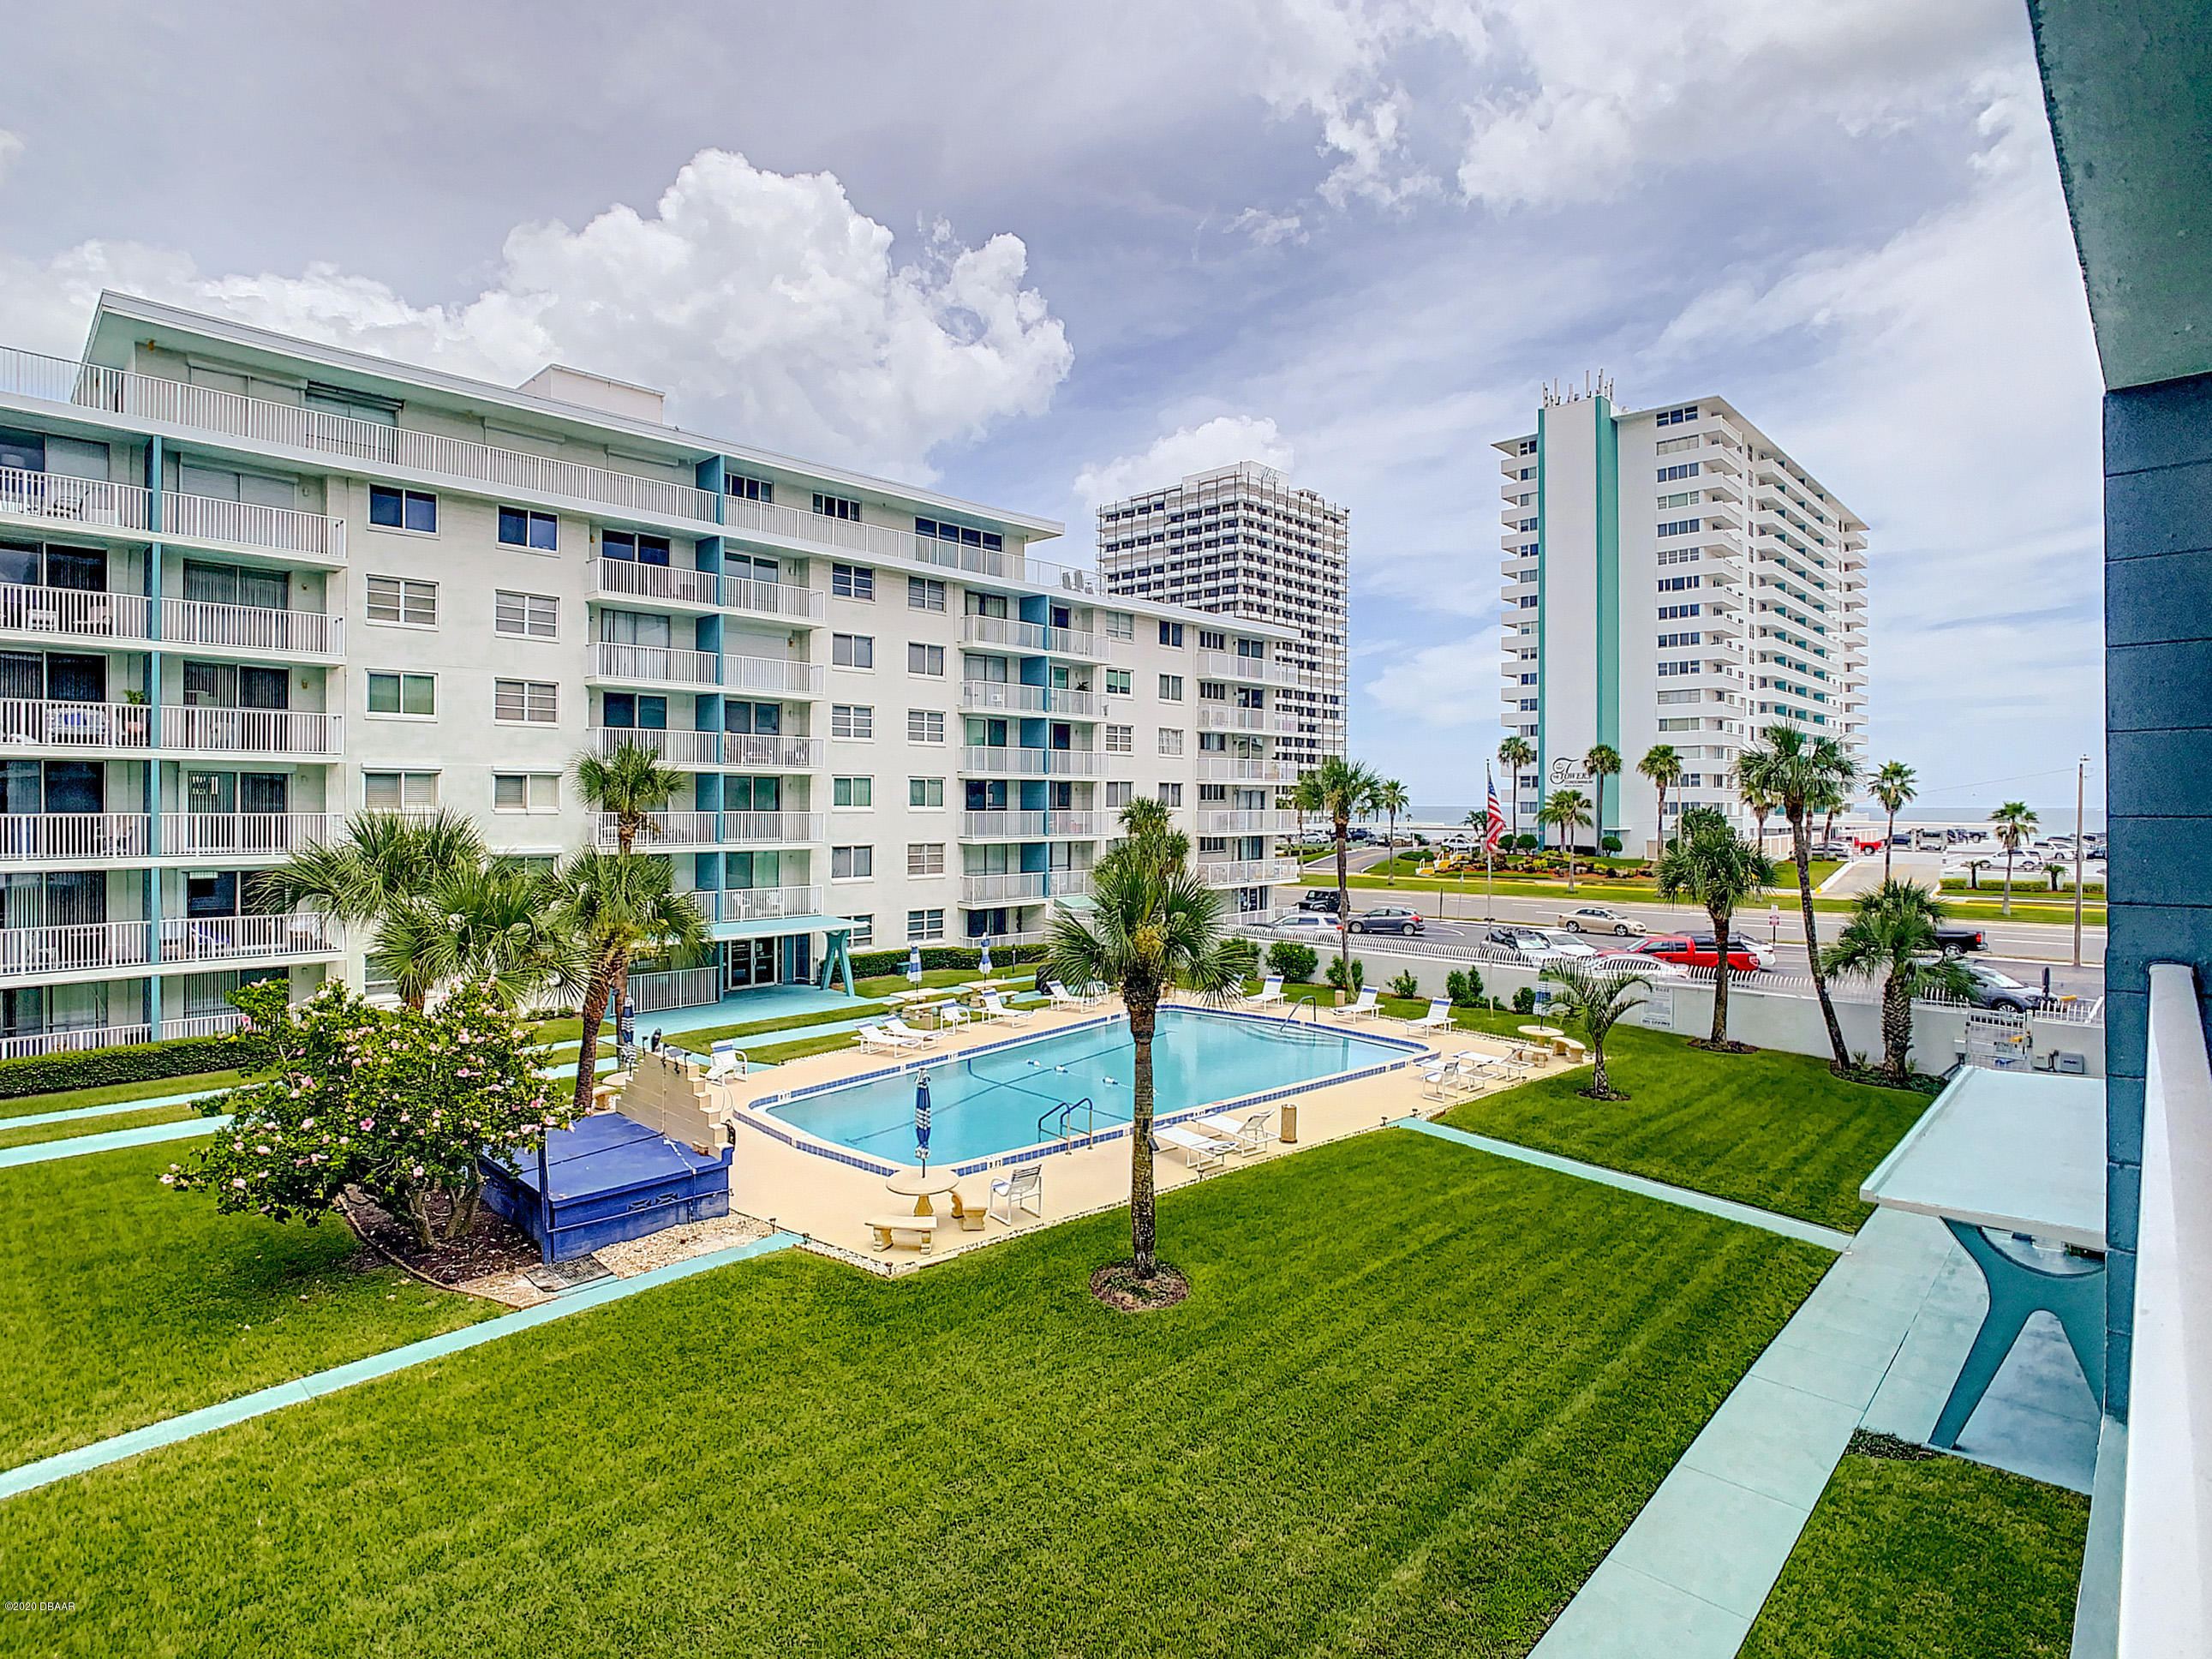 Details for 2727 Atlantic Avenue 3070, Daytona Beach, FL 32118